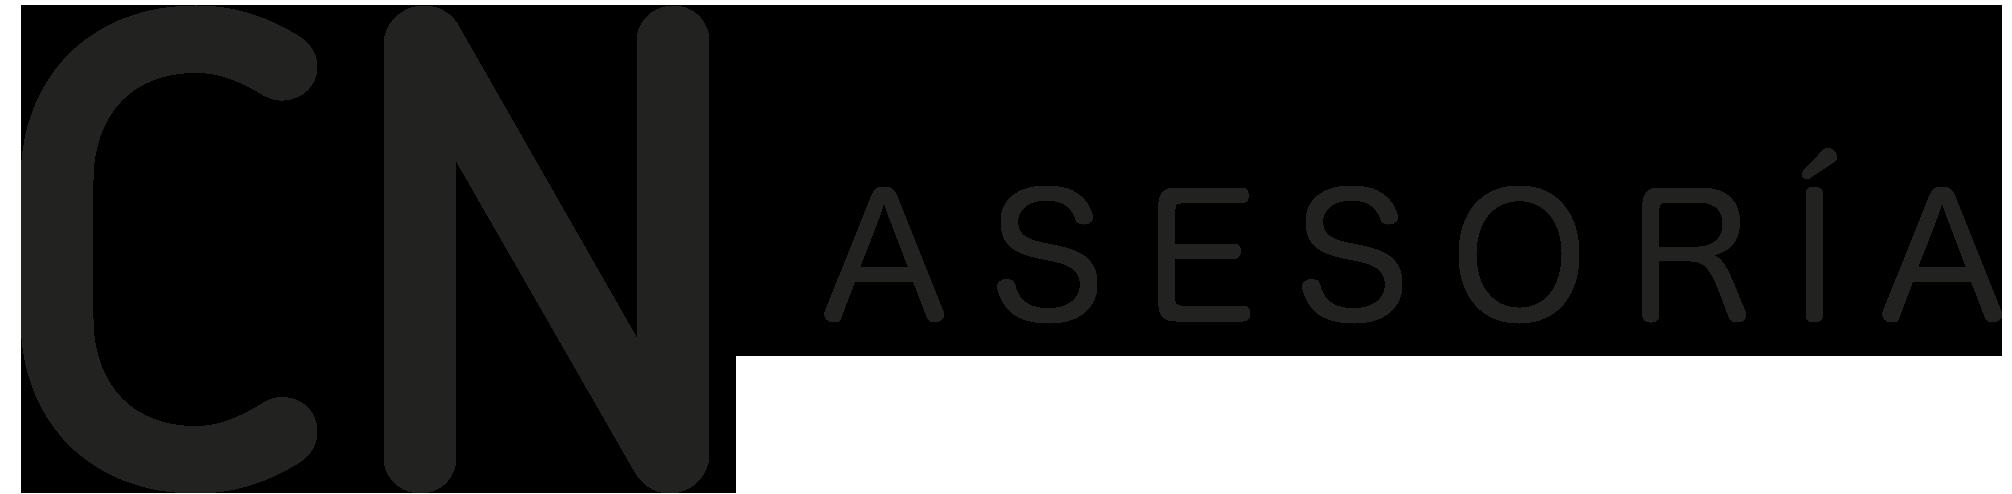 cn_logo